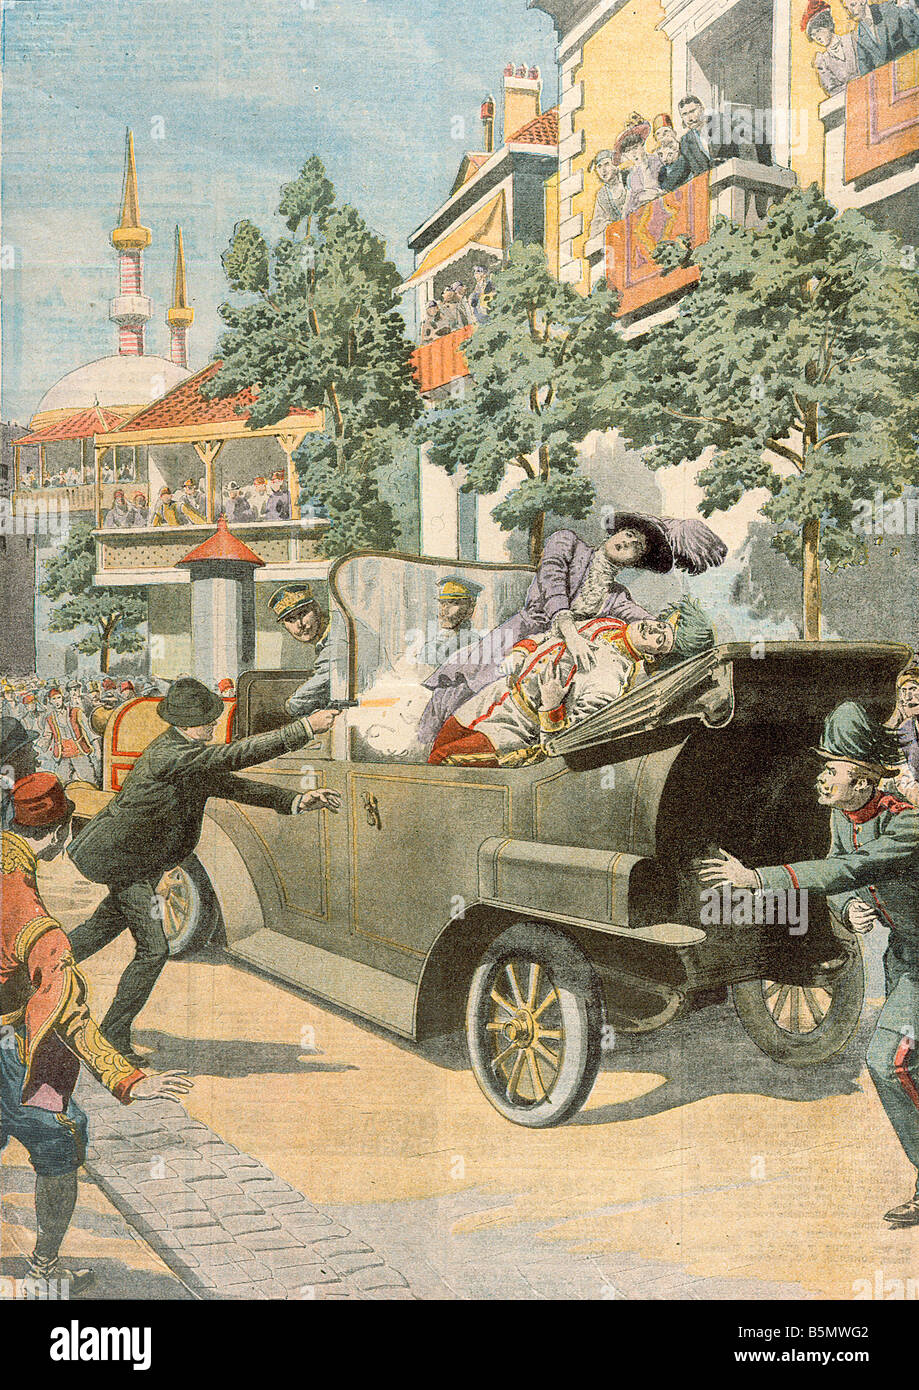 9OE 1914 6 28 A5 Assassination Franz Ferdinand Sarajevo Prehistory of the 1st World War Assassination of the Austro - Stock Image